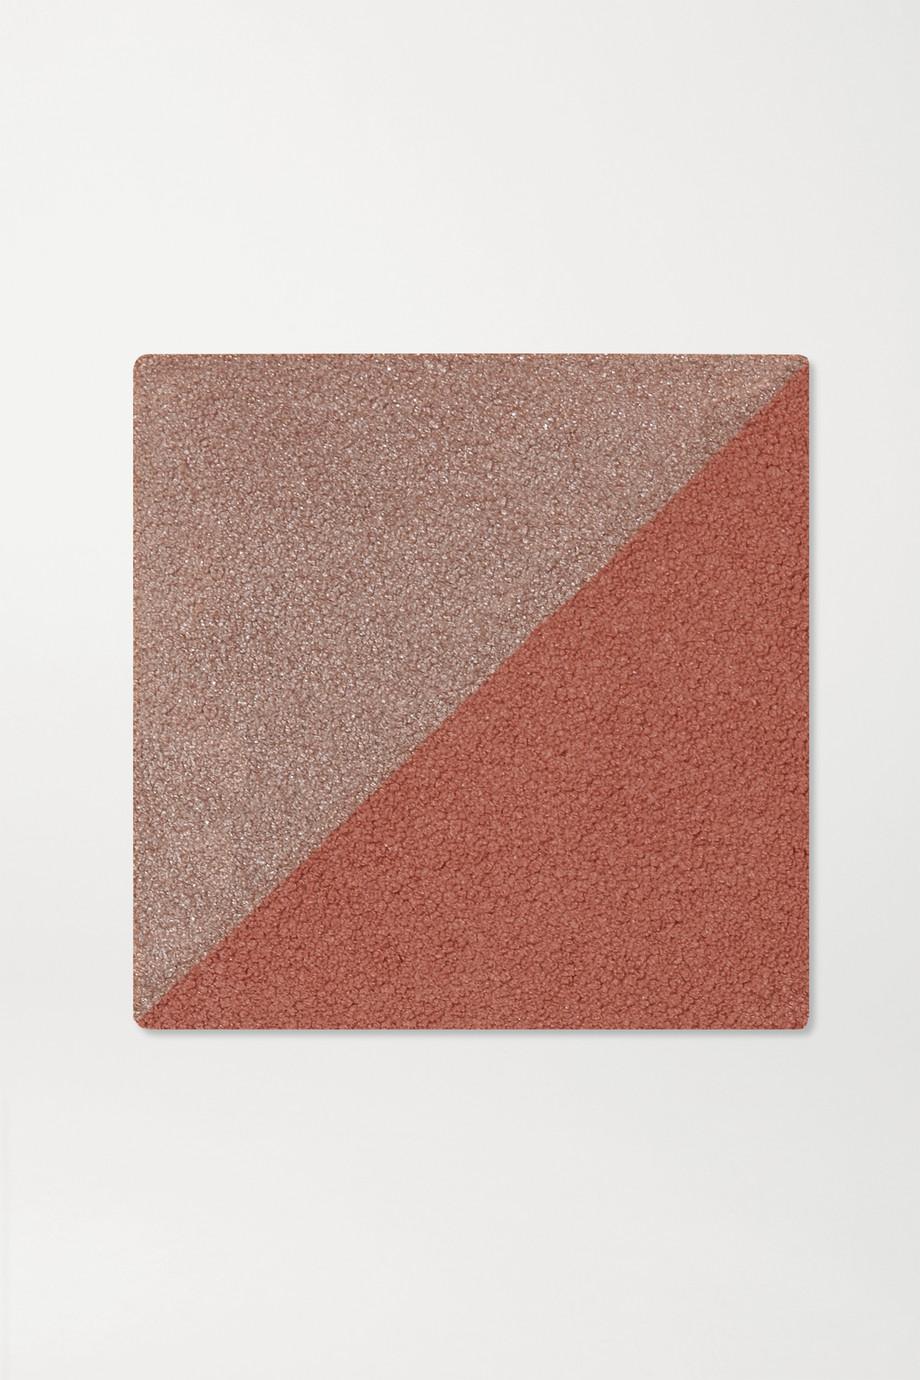 Kjaer Weis Flush and Glow Duo – Inner Light – Rouge und Highlighter